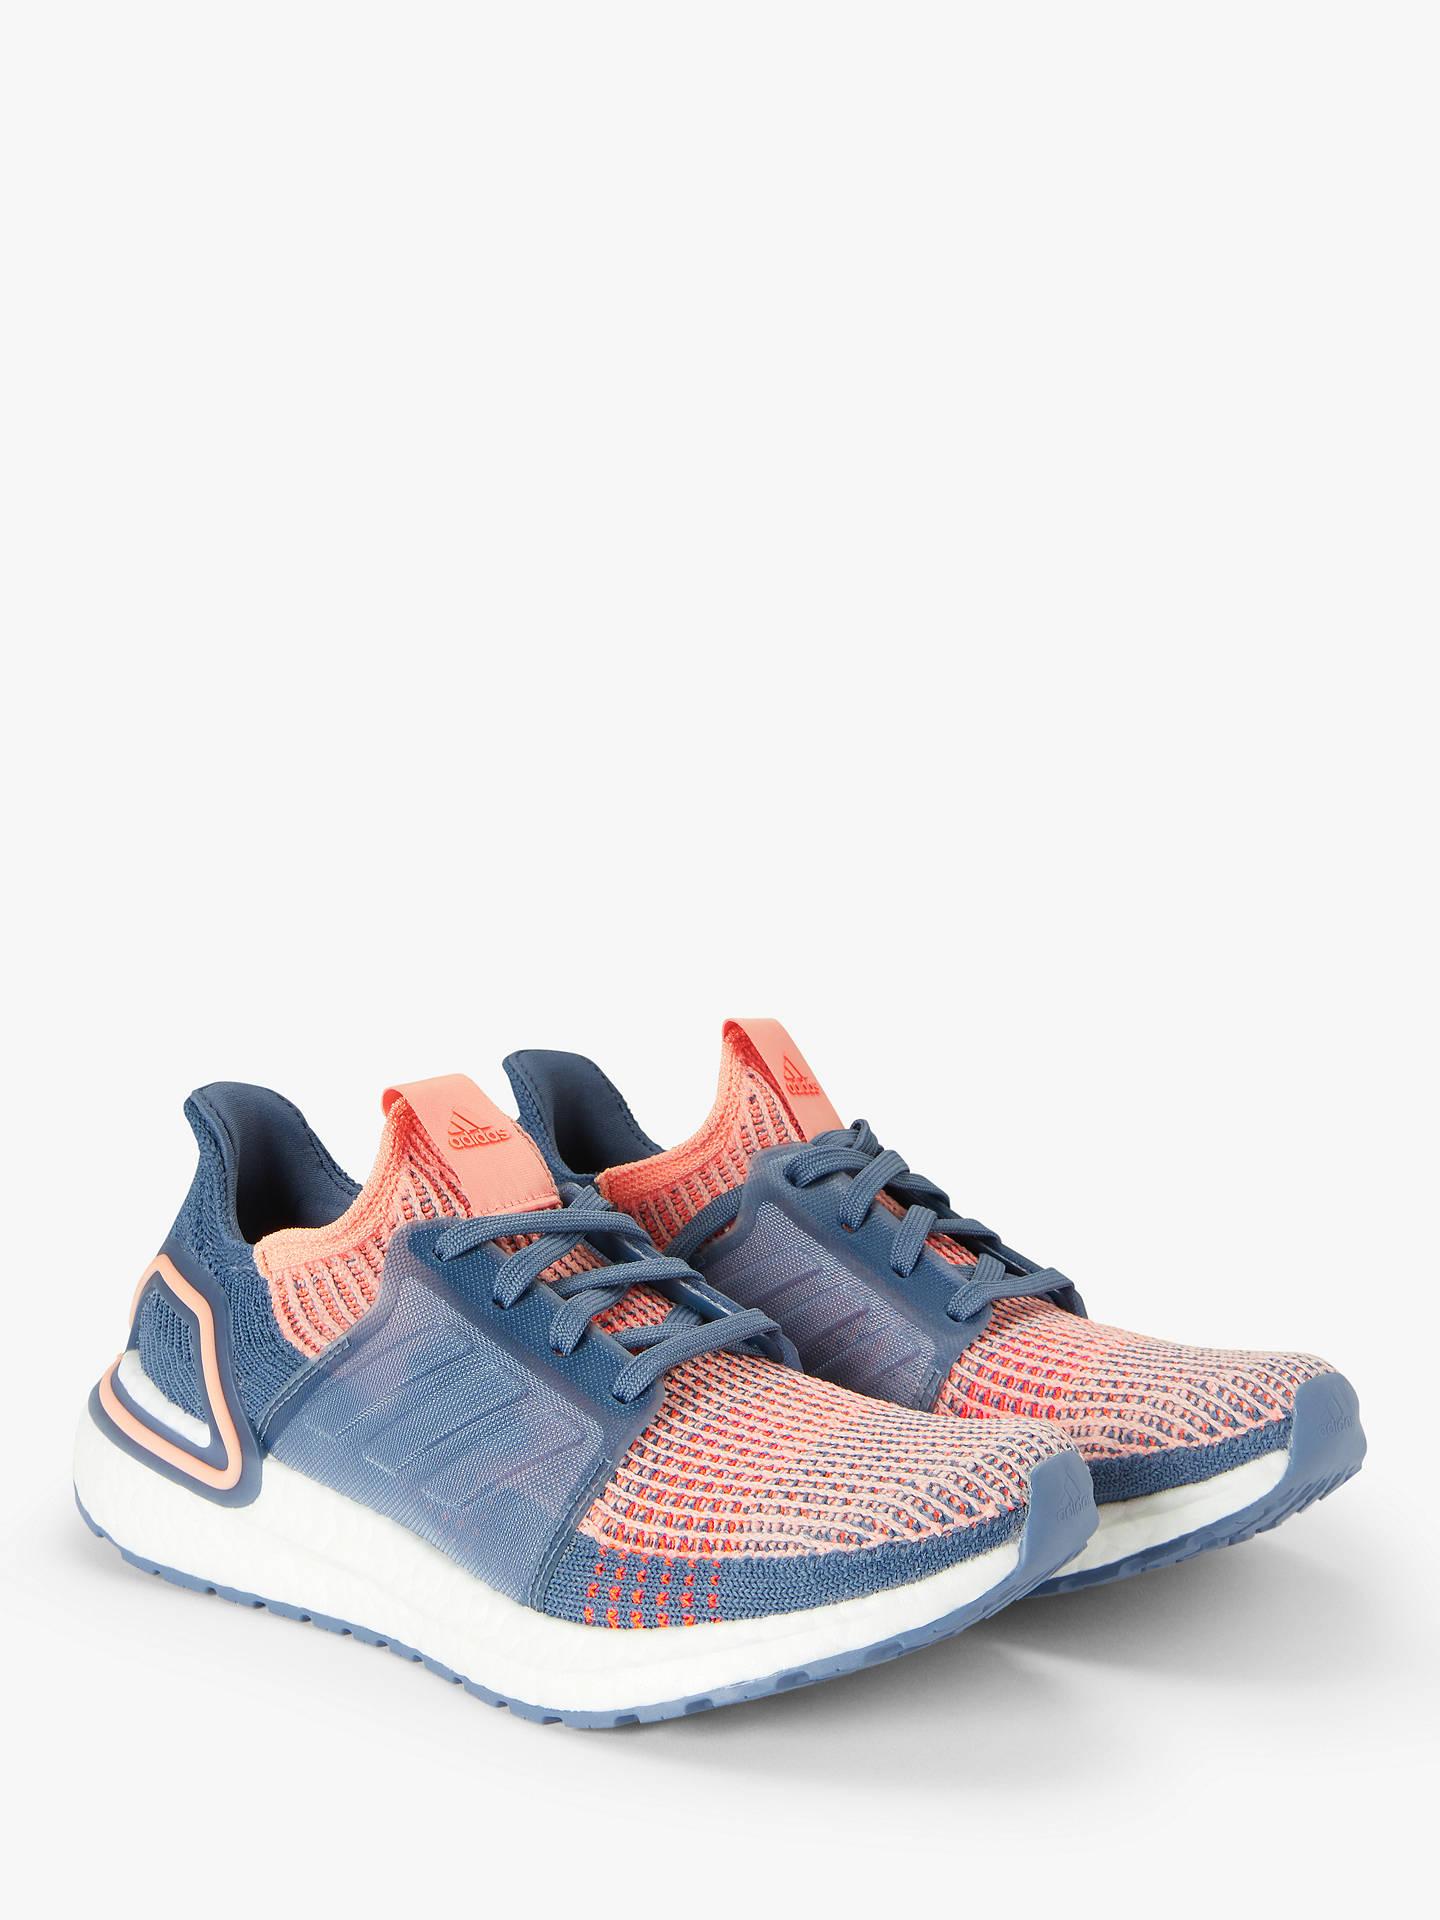 newest 6c57d 3dbc0 adidas UltraBOOST 19 Women's Running Shoes, Glow Pink/Tech Ink/Solar Orange